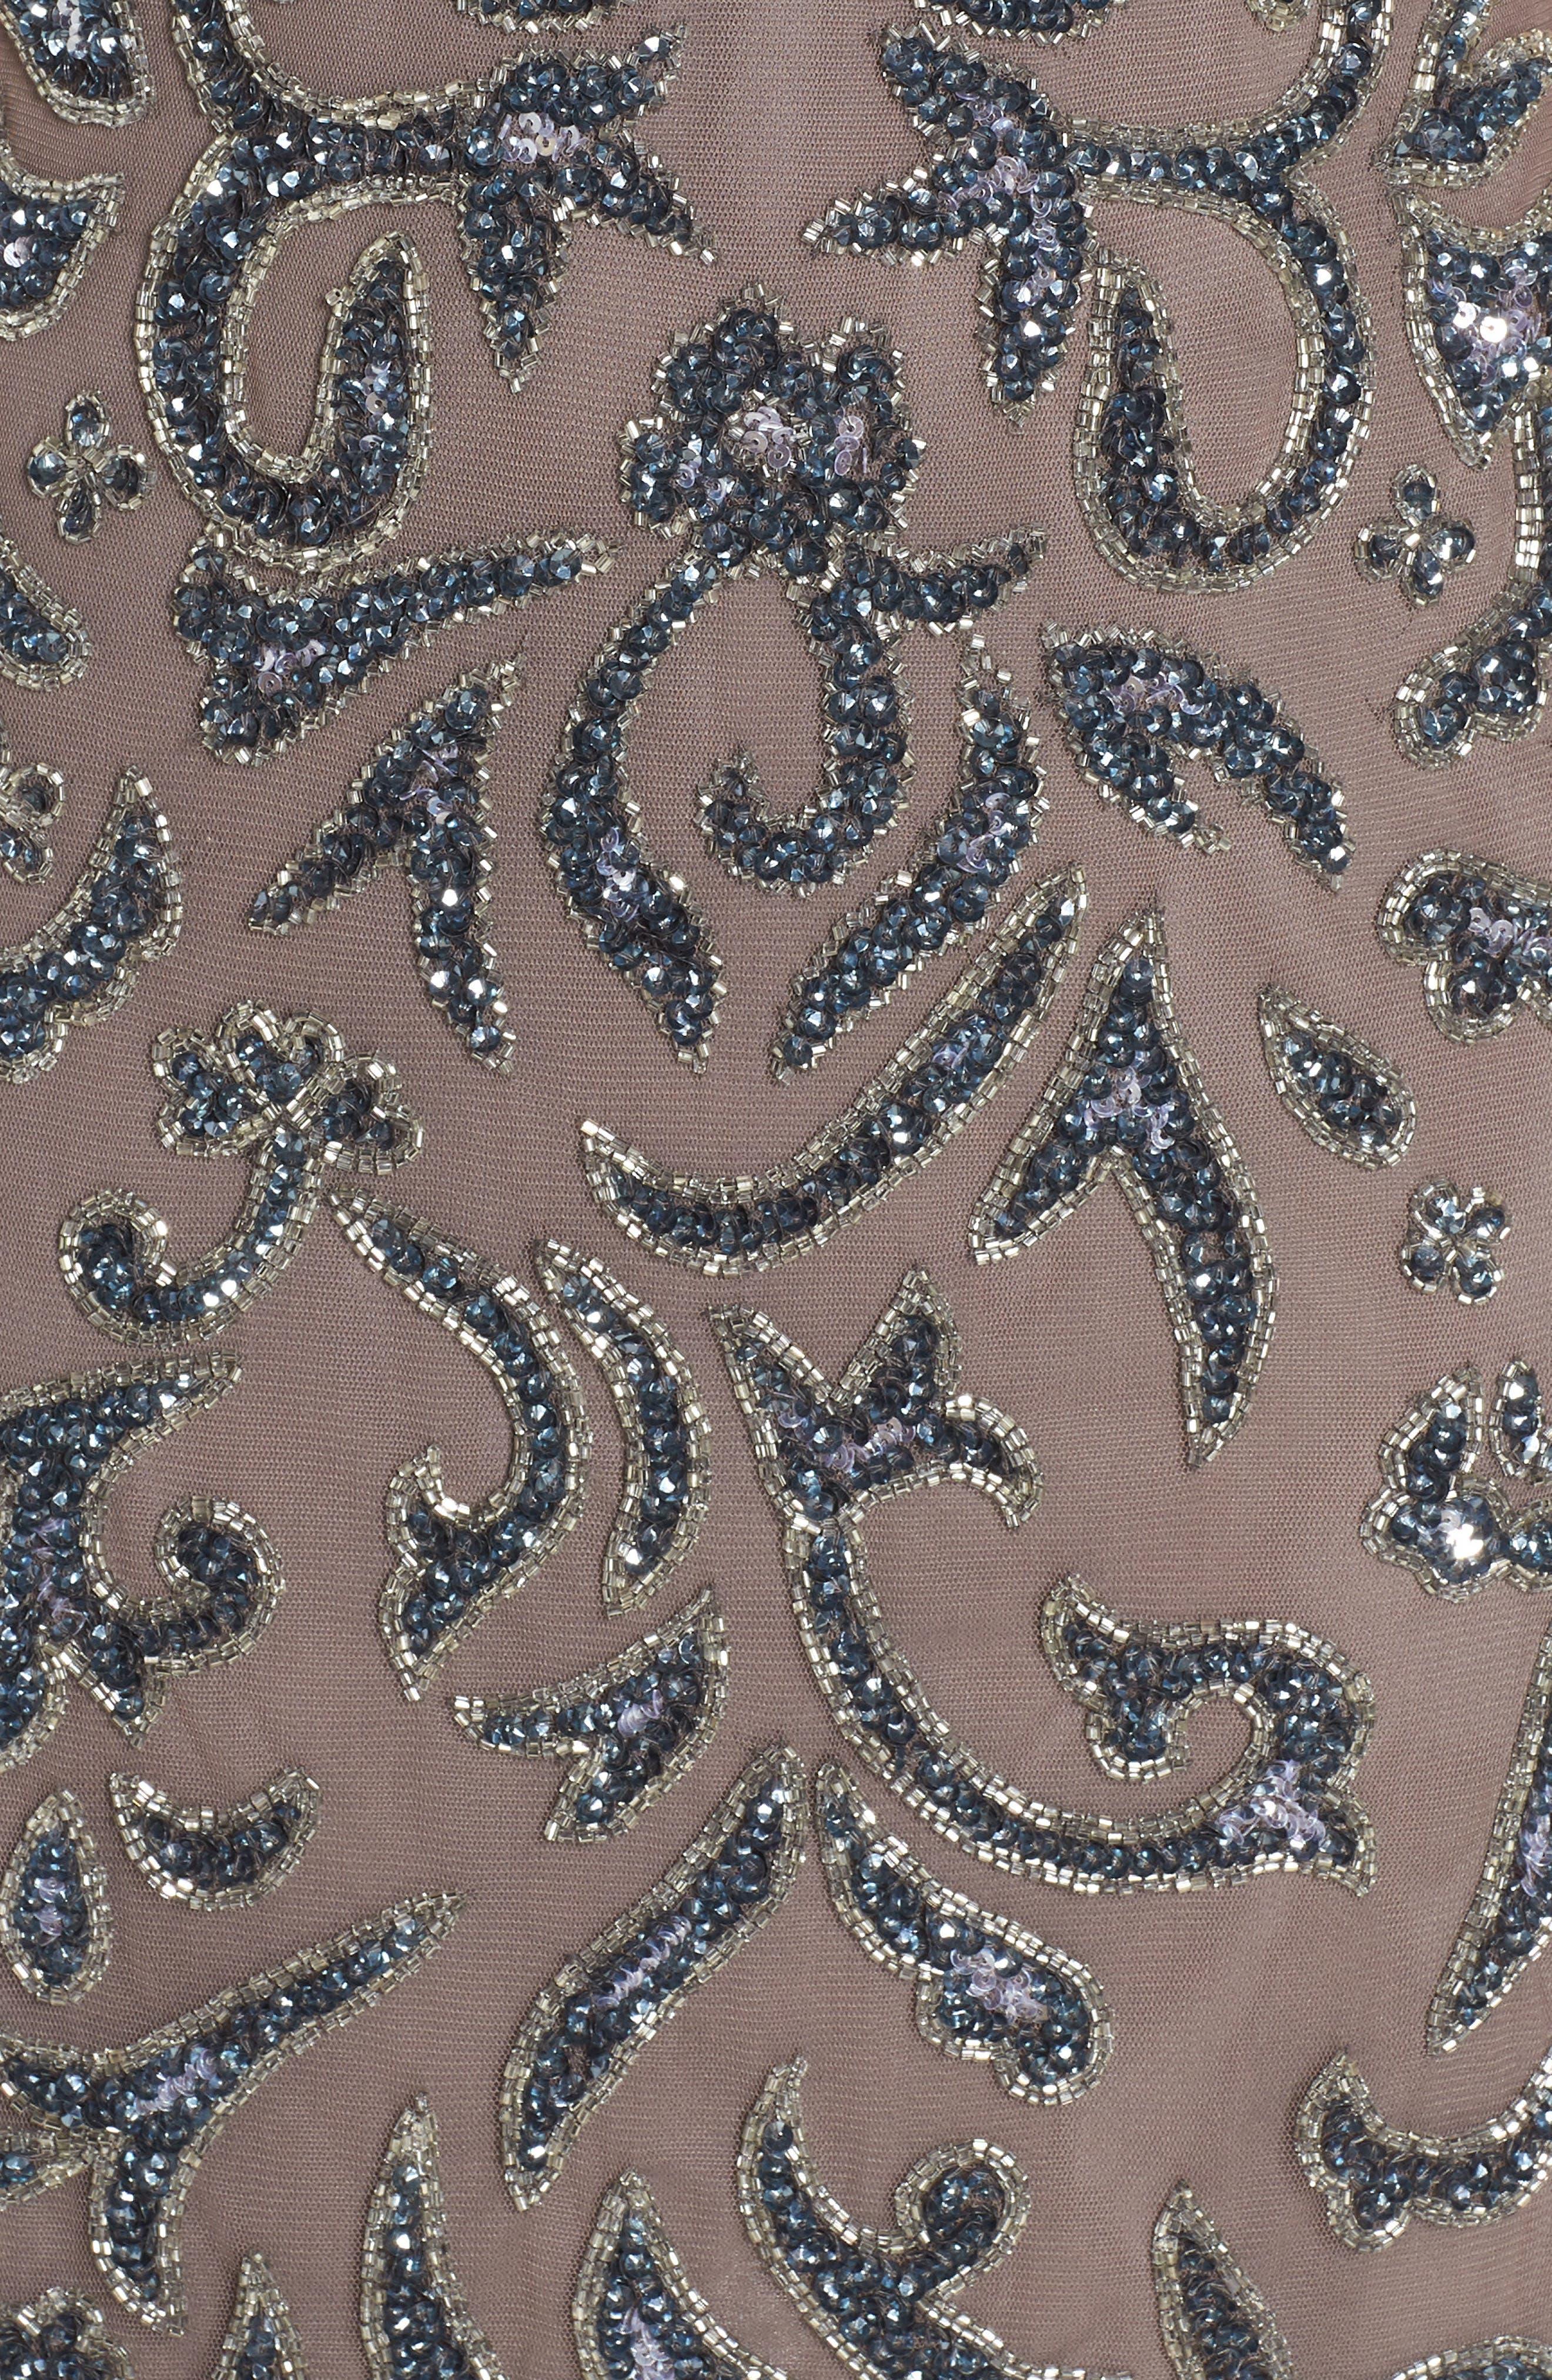 Sequin & Bead Embellished Sheath,                             Alternate thumbnail 6, color,                             SMOKE